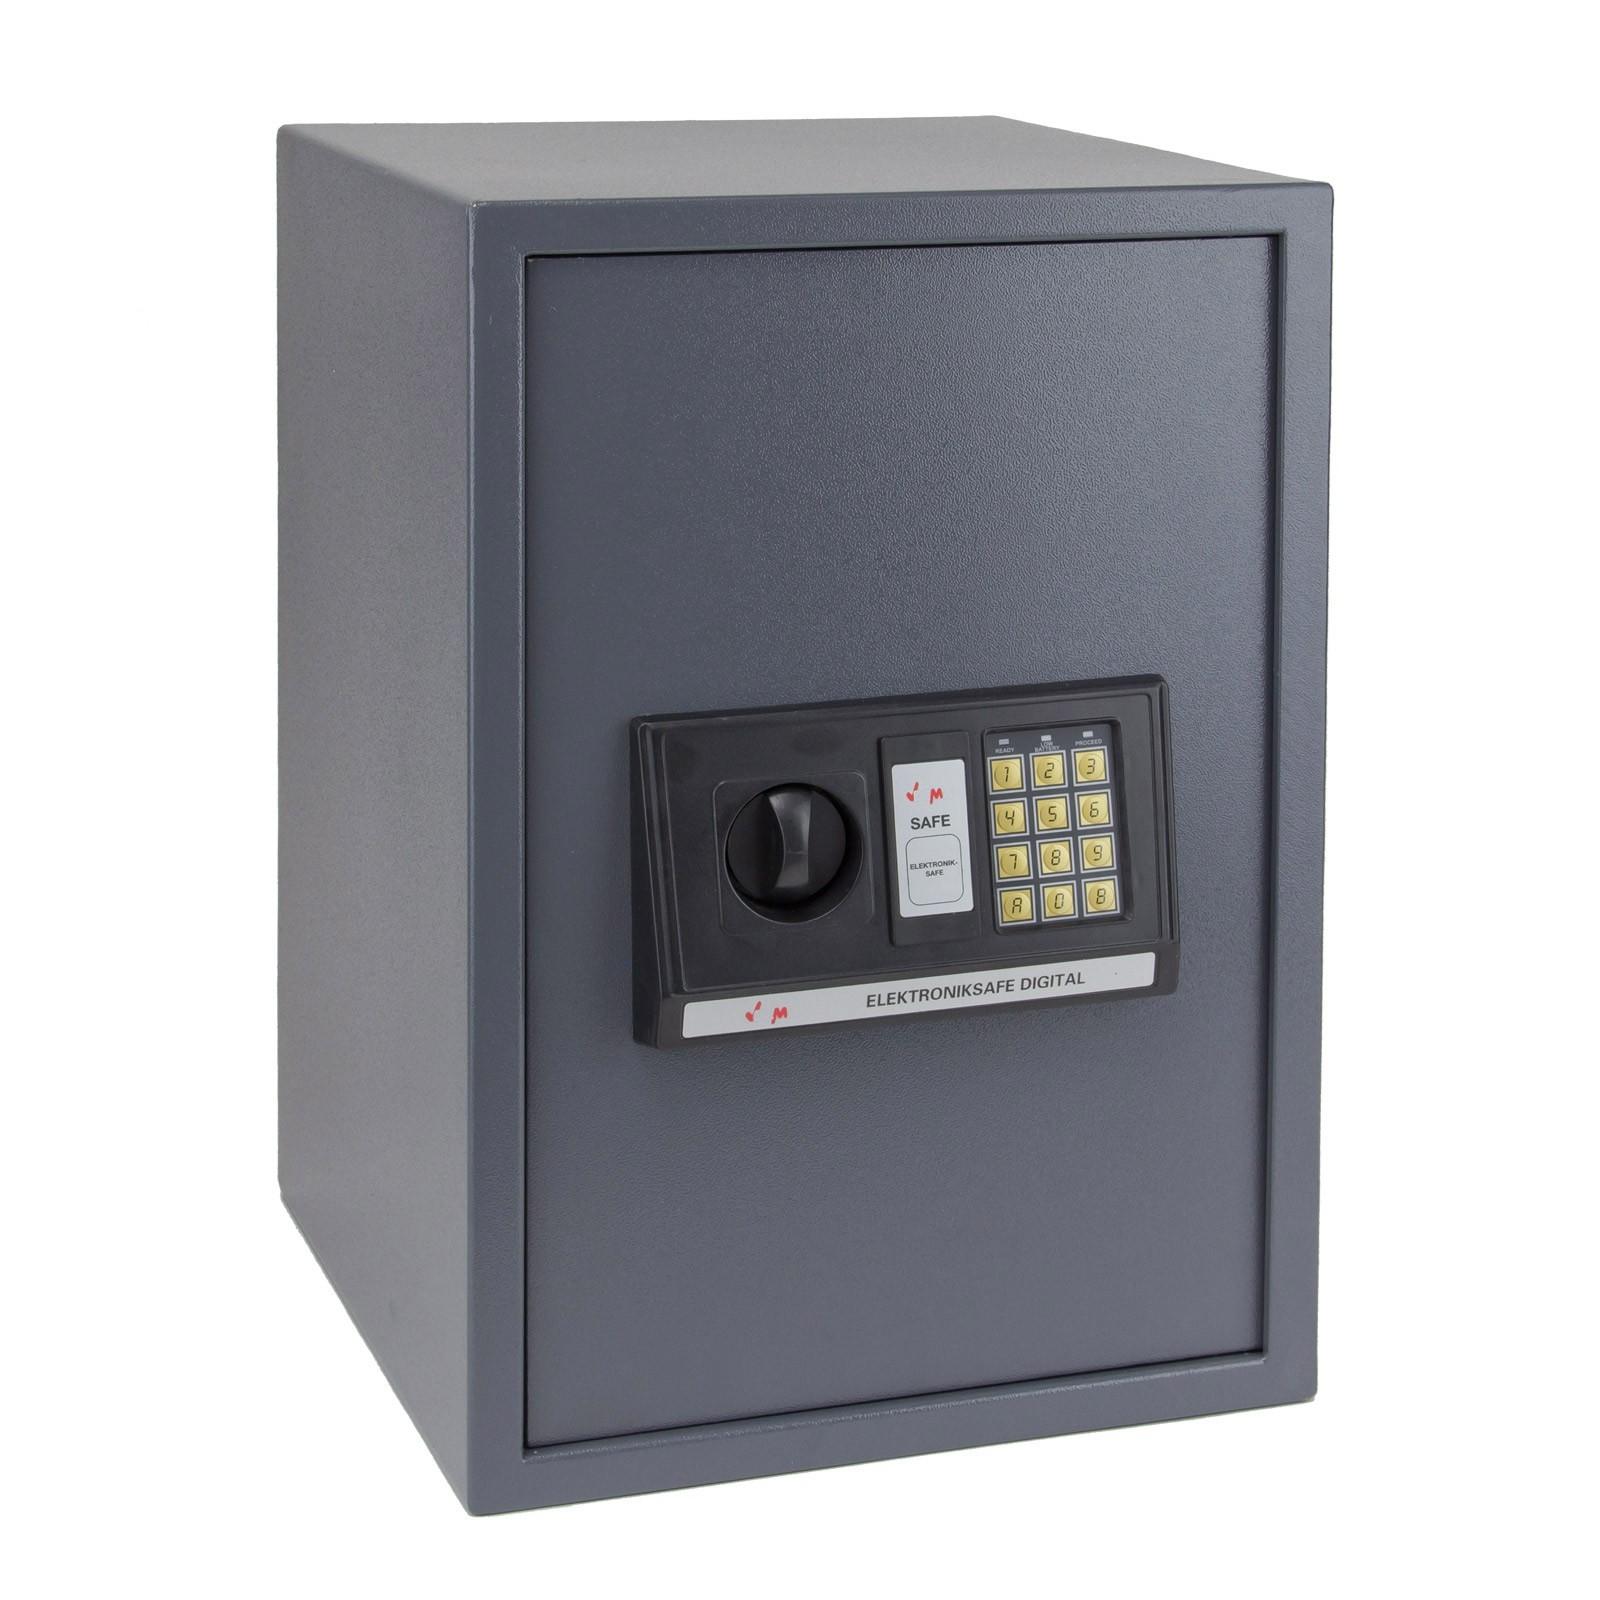 Dema Möbeltresor Wandtresor Tresor Safe Wandsafe Digital 65L 35x36x52cm 20945